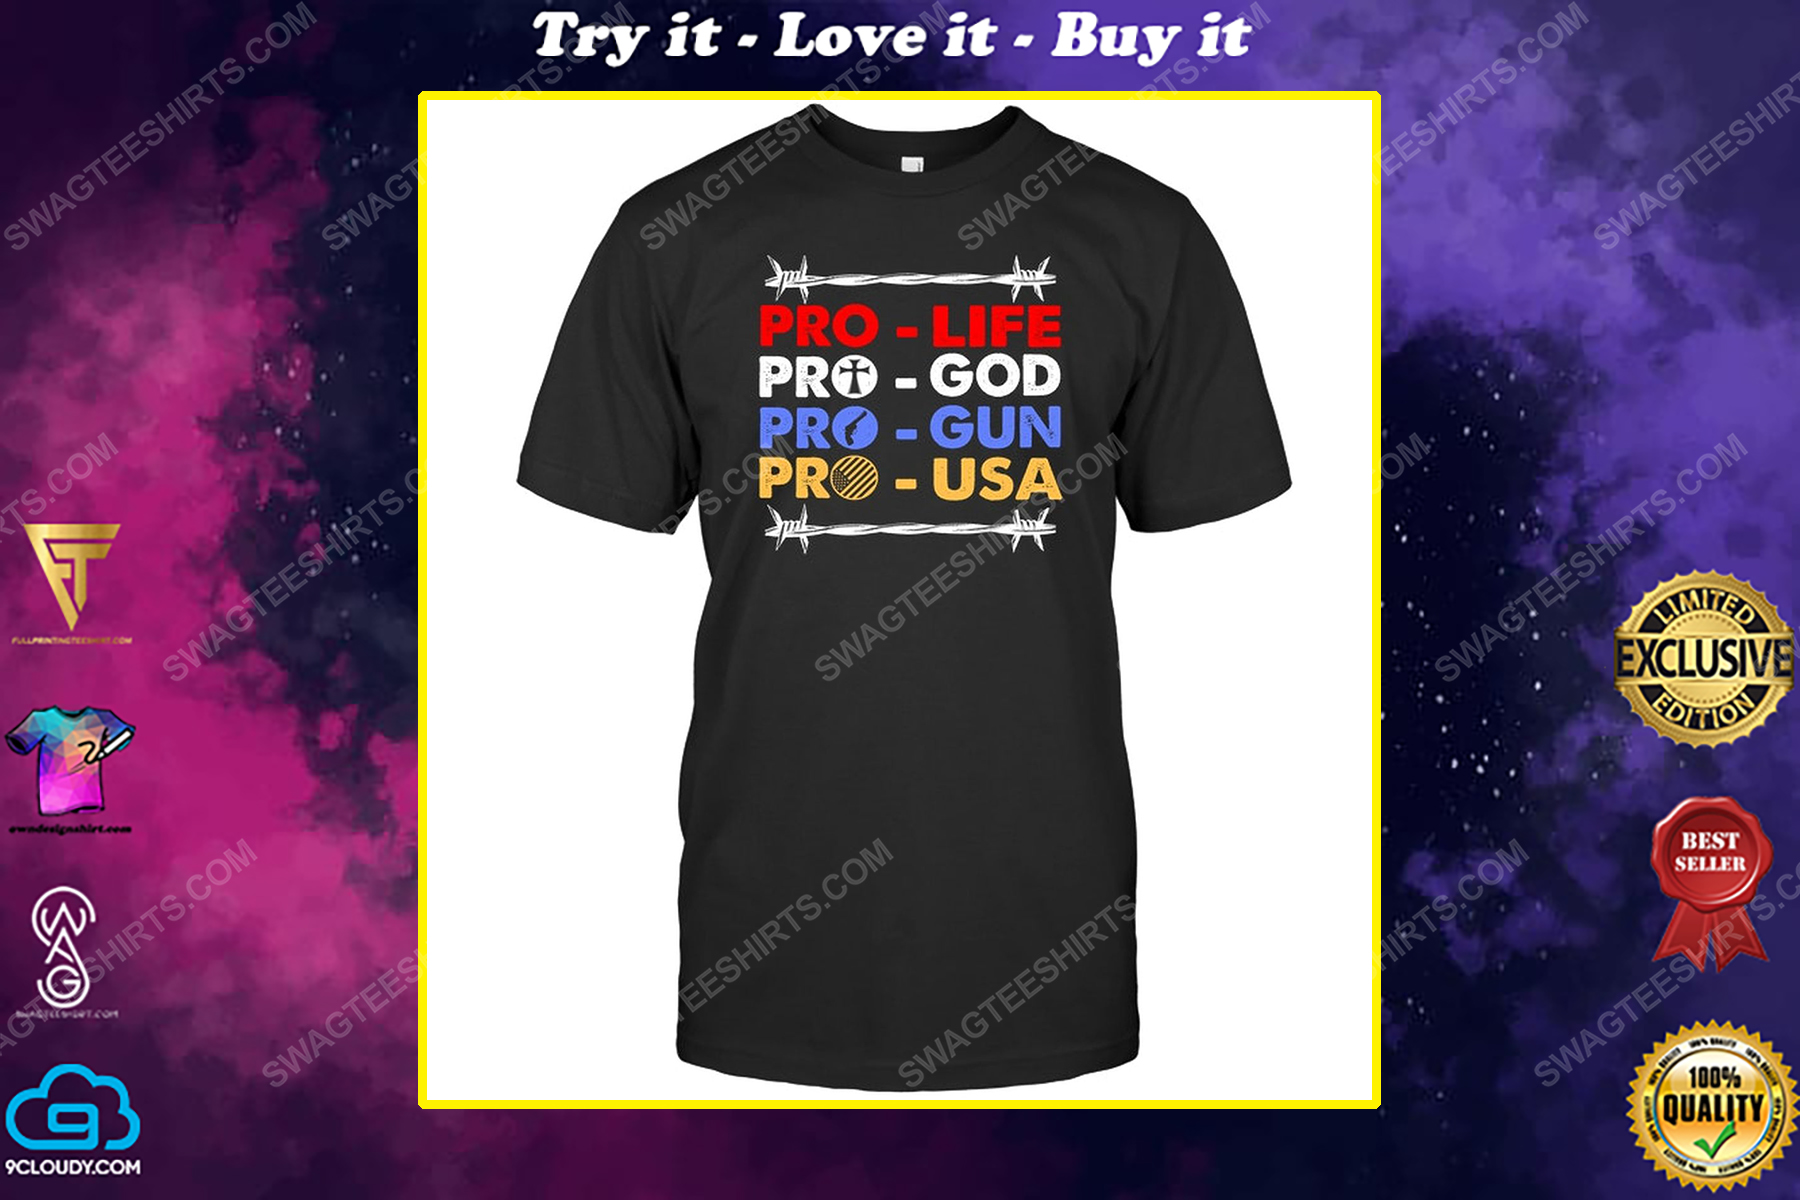 Pro life pro god pro gun pro usa political shirt